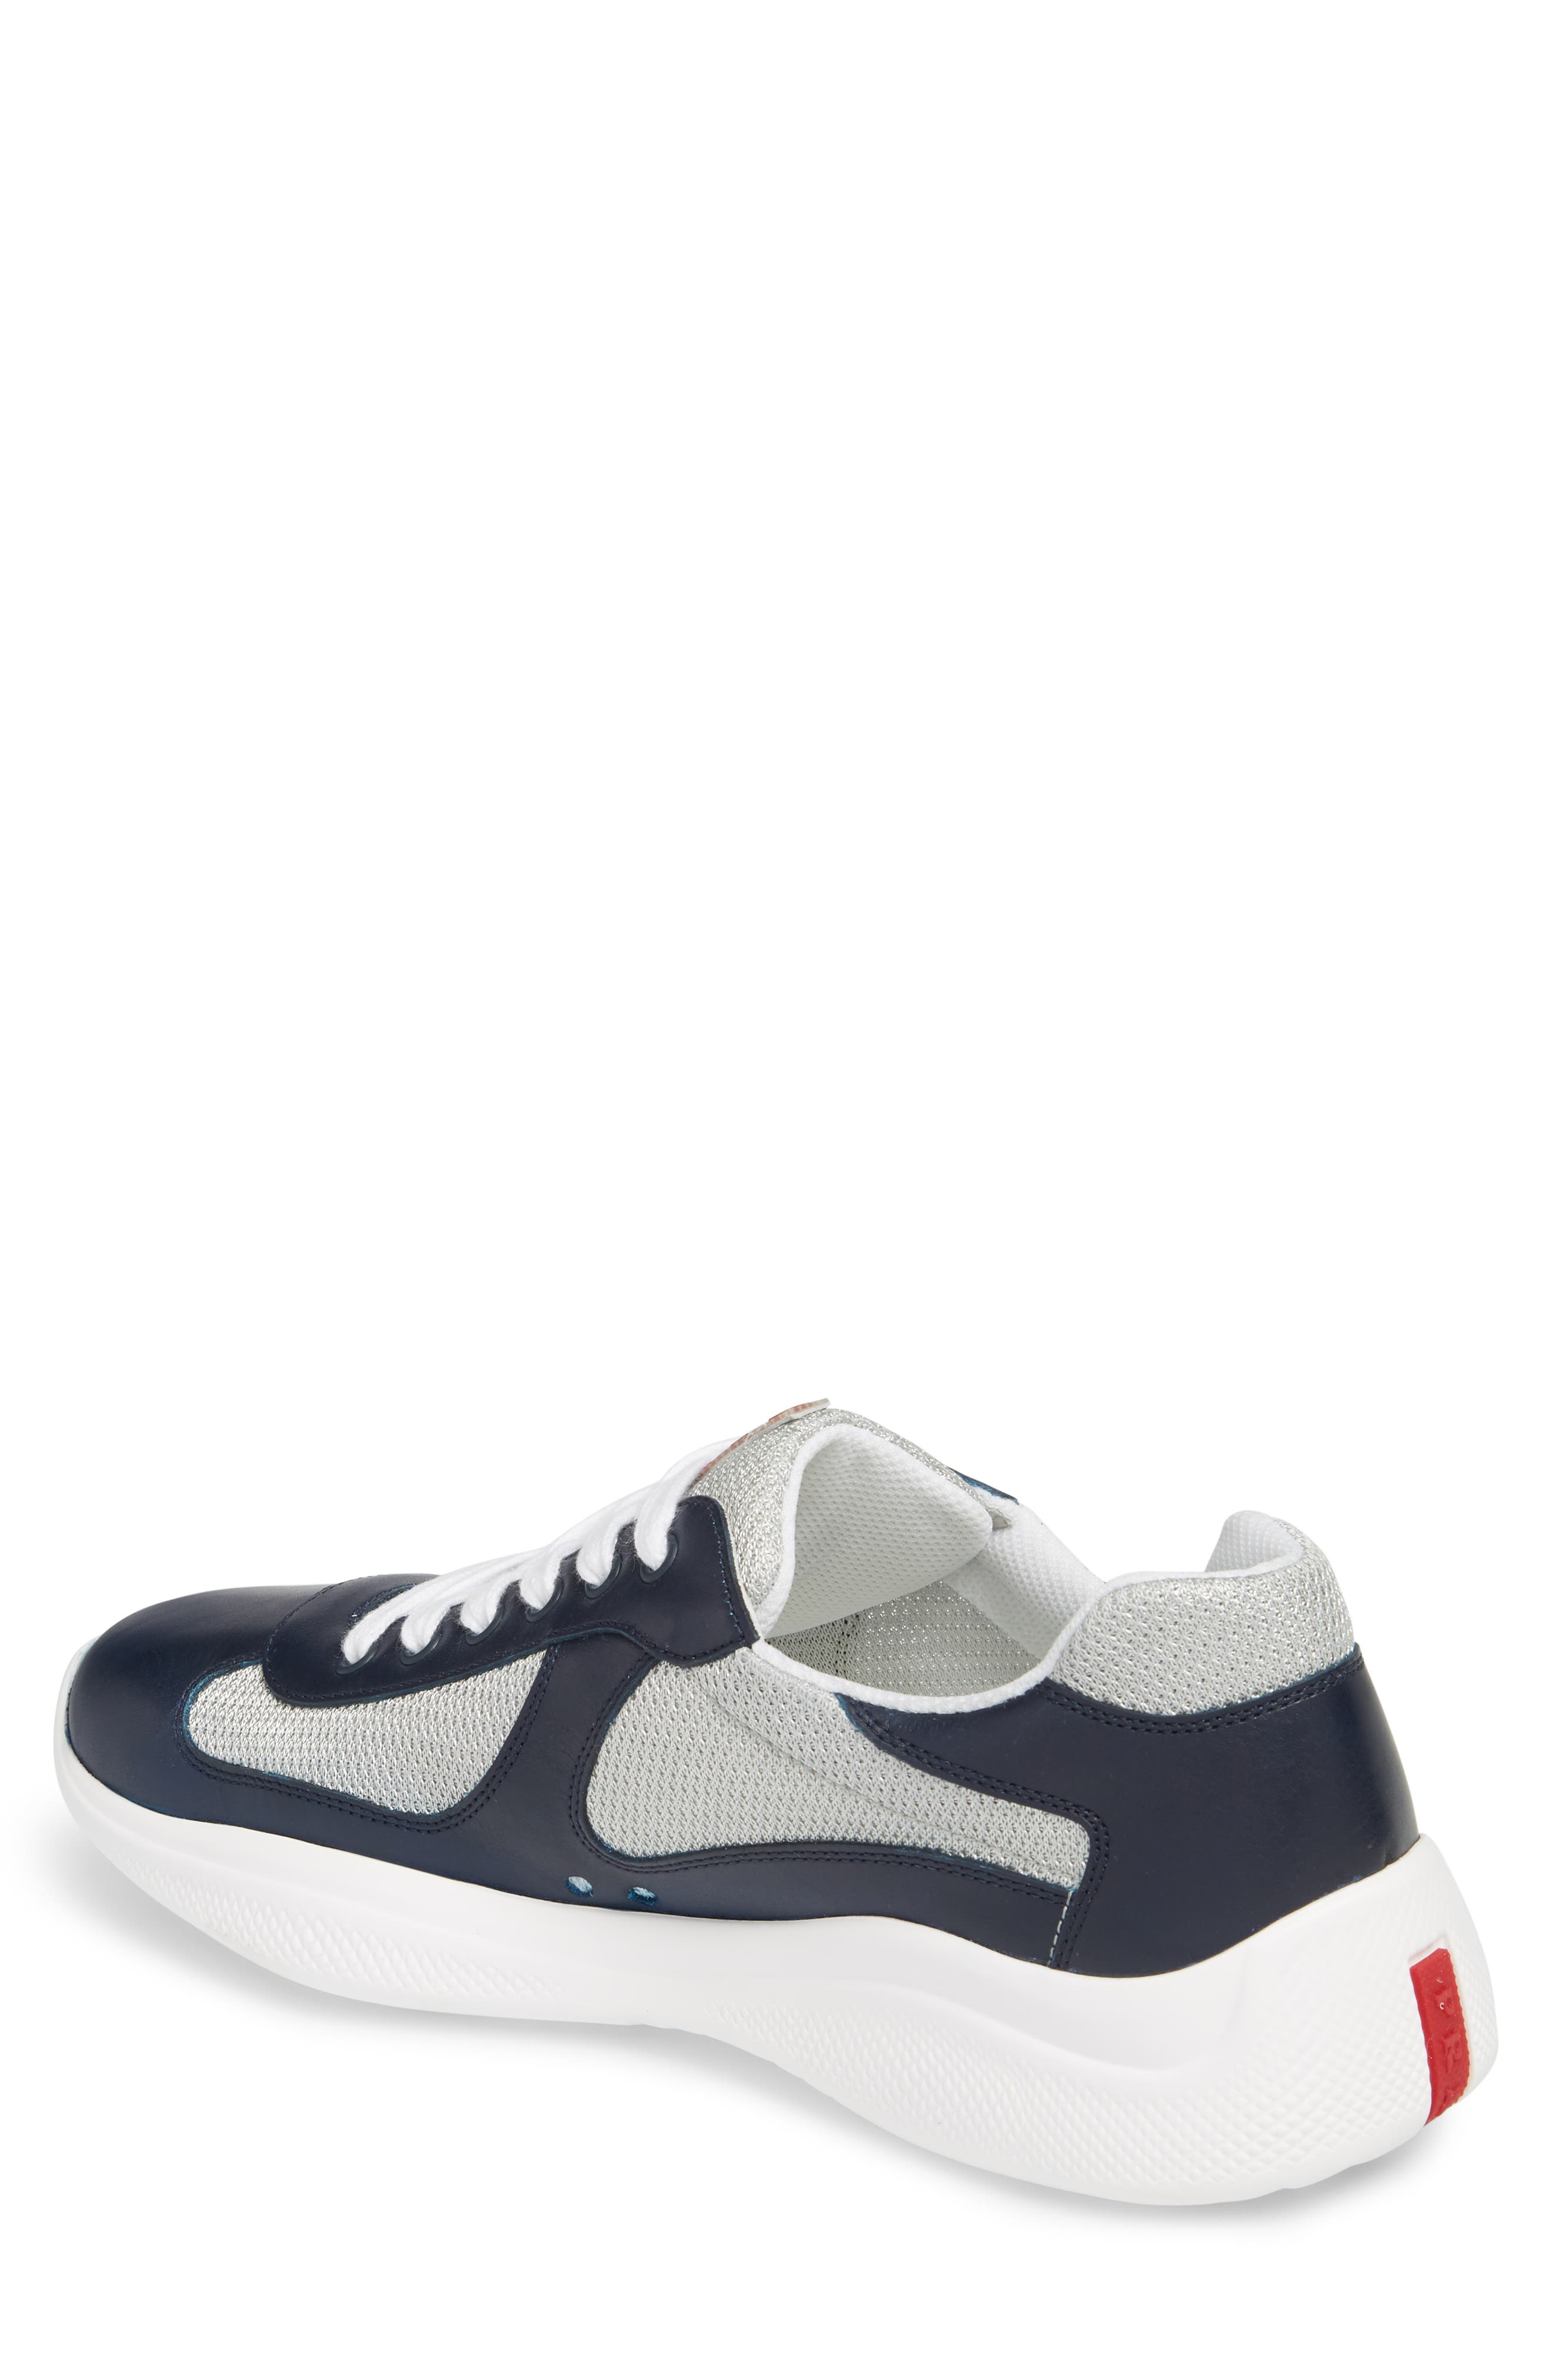 'Punta Ala' Sneaker,                             Alternate thumbnail 2, color,                             Baltic Blue/ Argento